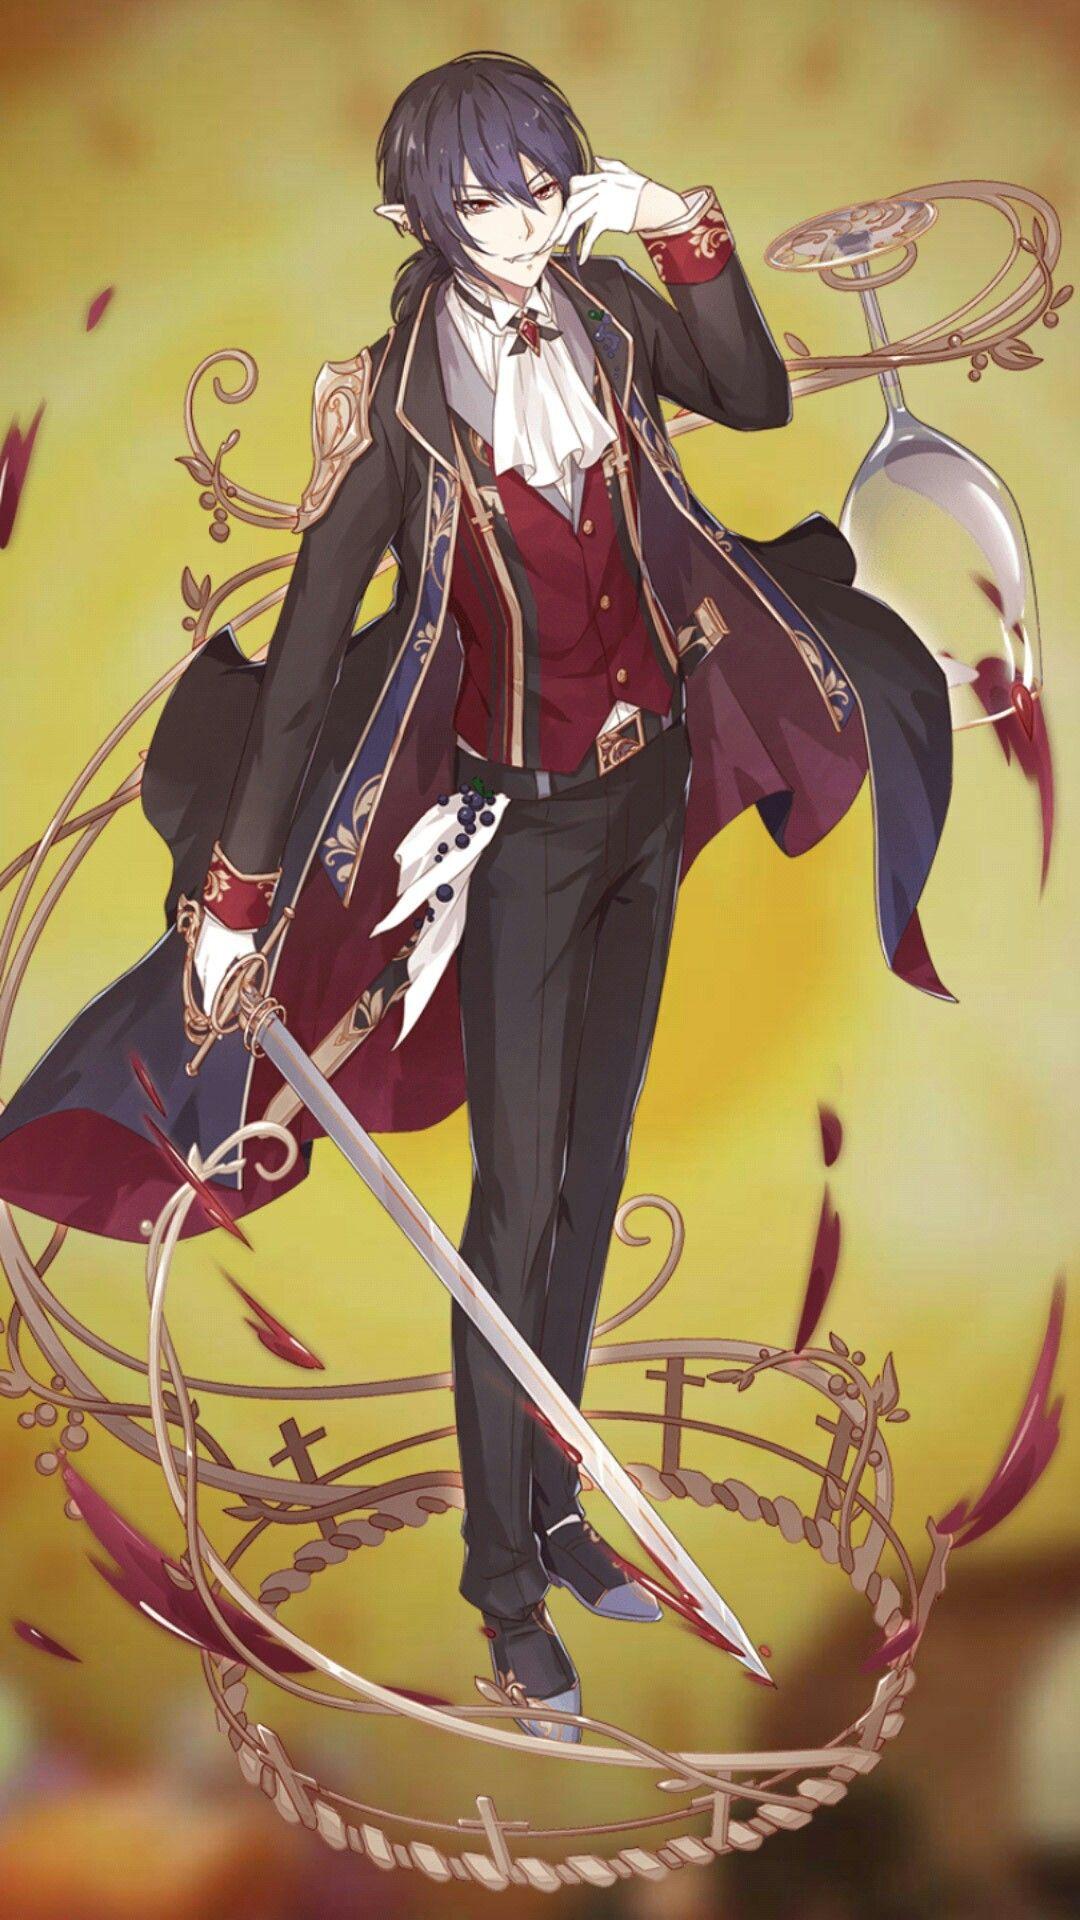 Rượu vang đỏ (Red Wine) Food fantasy, Anime art fantasy